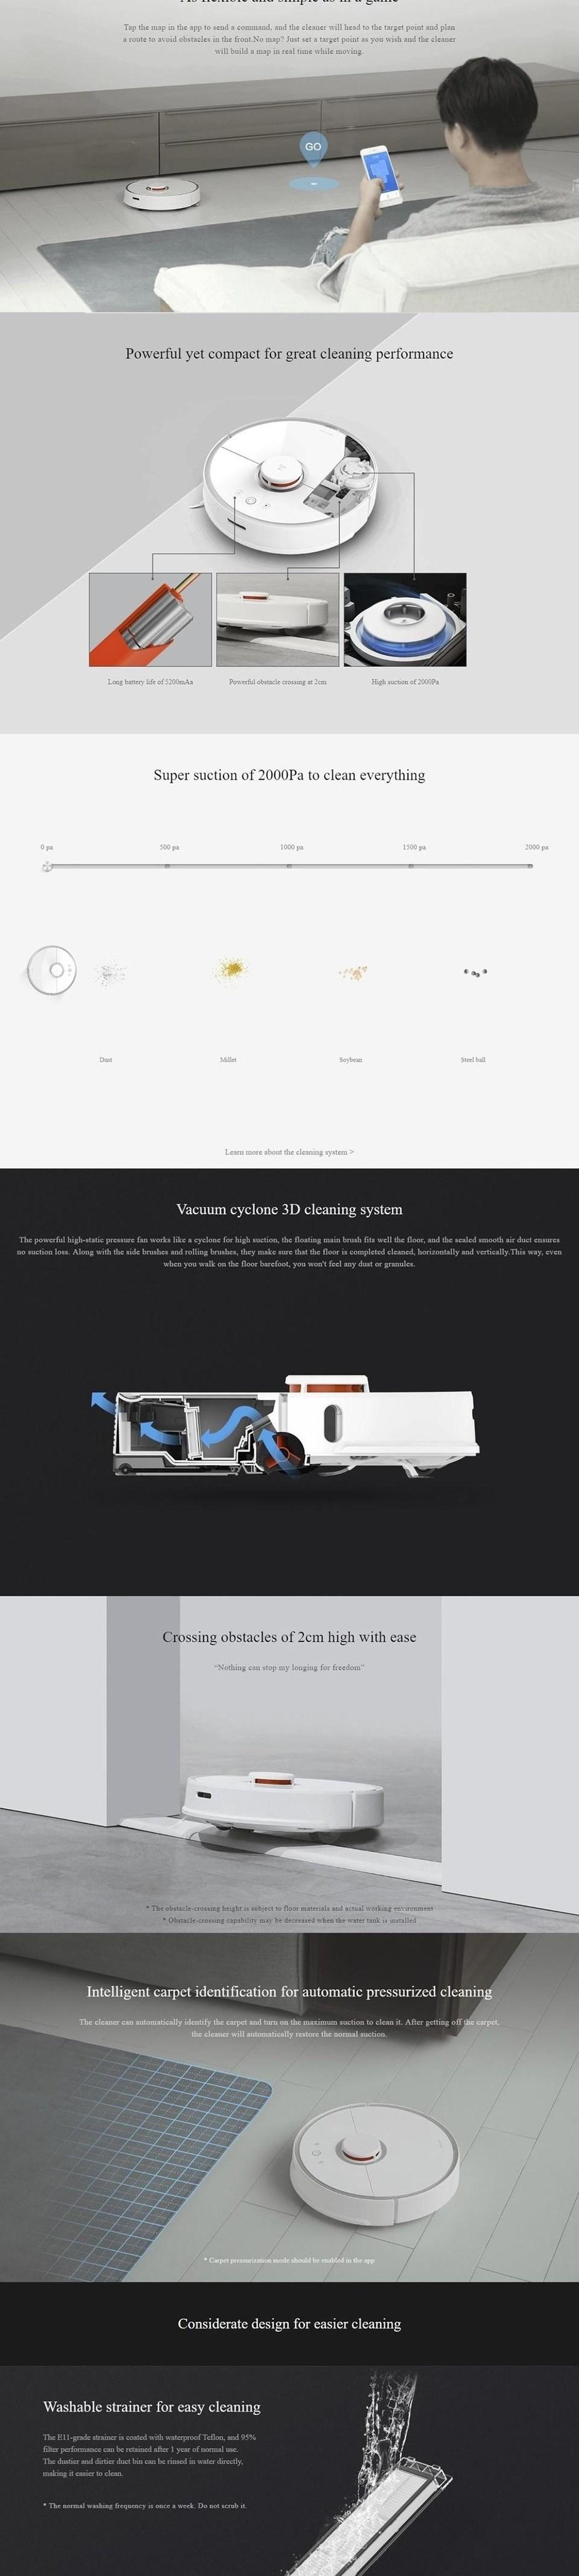 Xiaomi Mi Roborock S50 2nd Gen Vacuum Cleaner - RSD0028AU